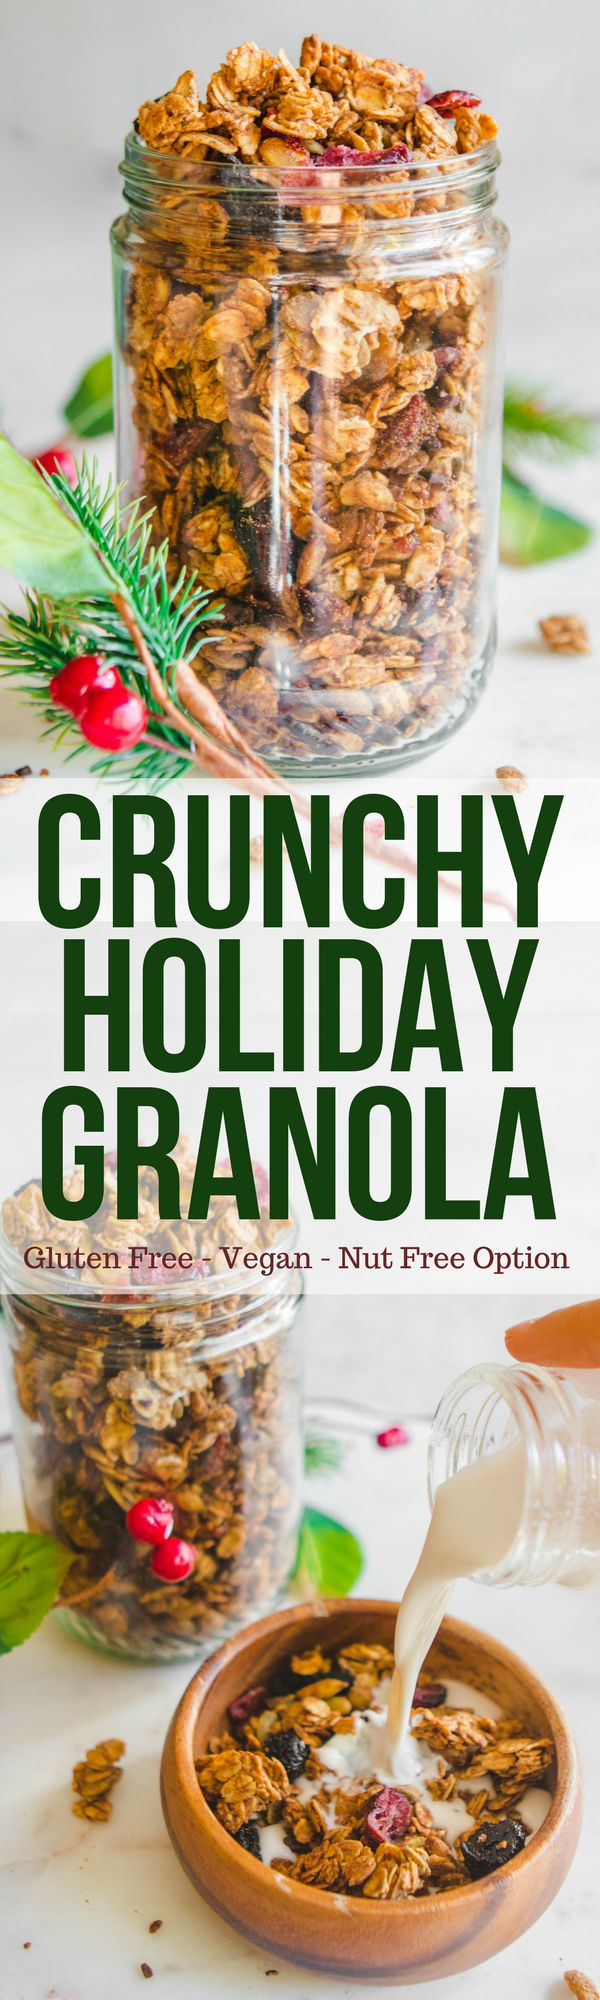 Crunchy Holiday Granola - Easy Vegan Breakfast Recipe